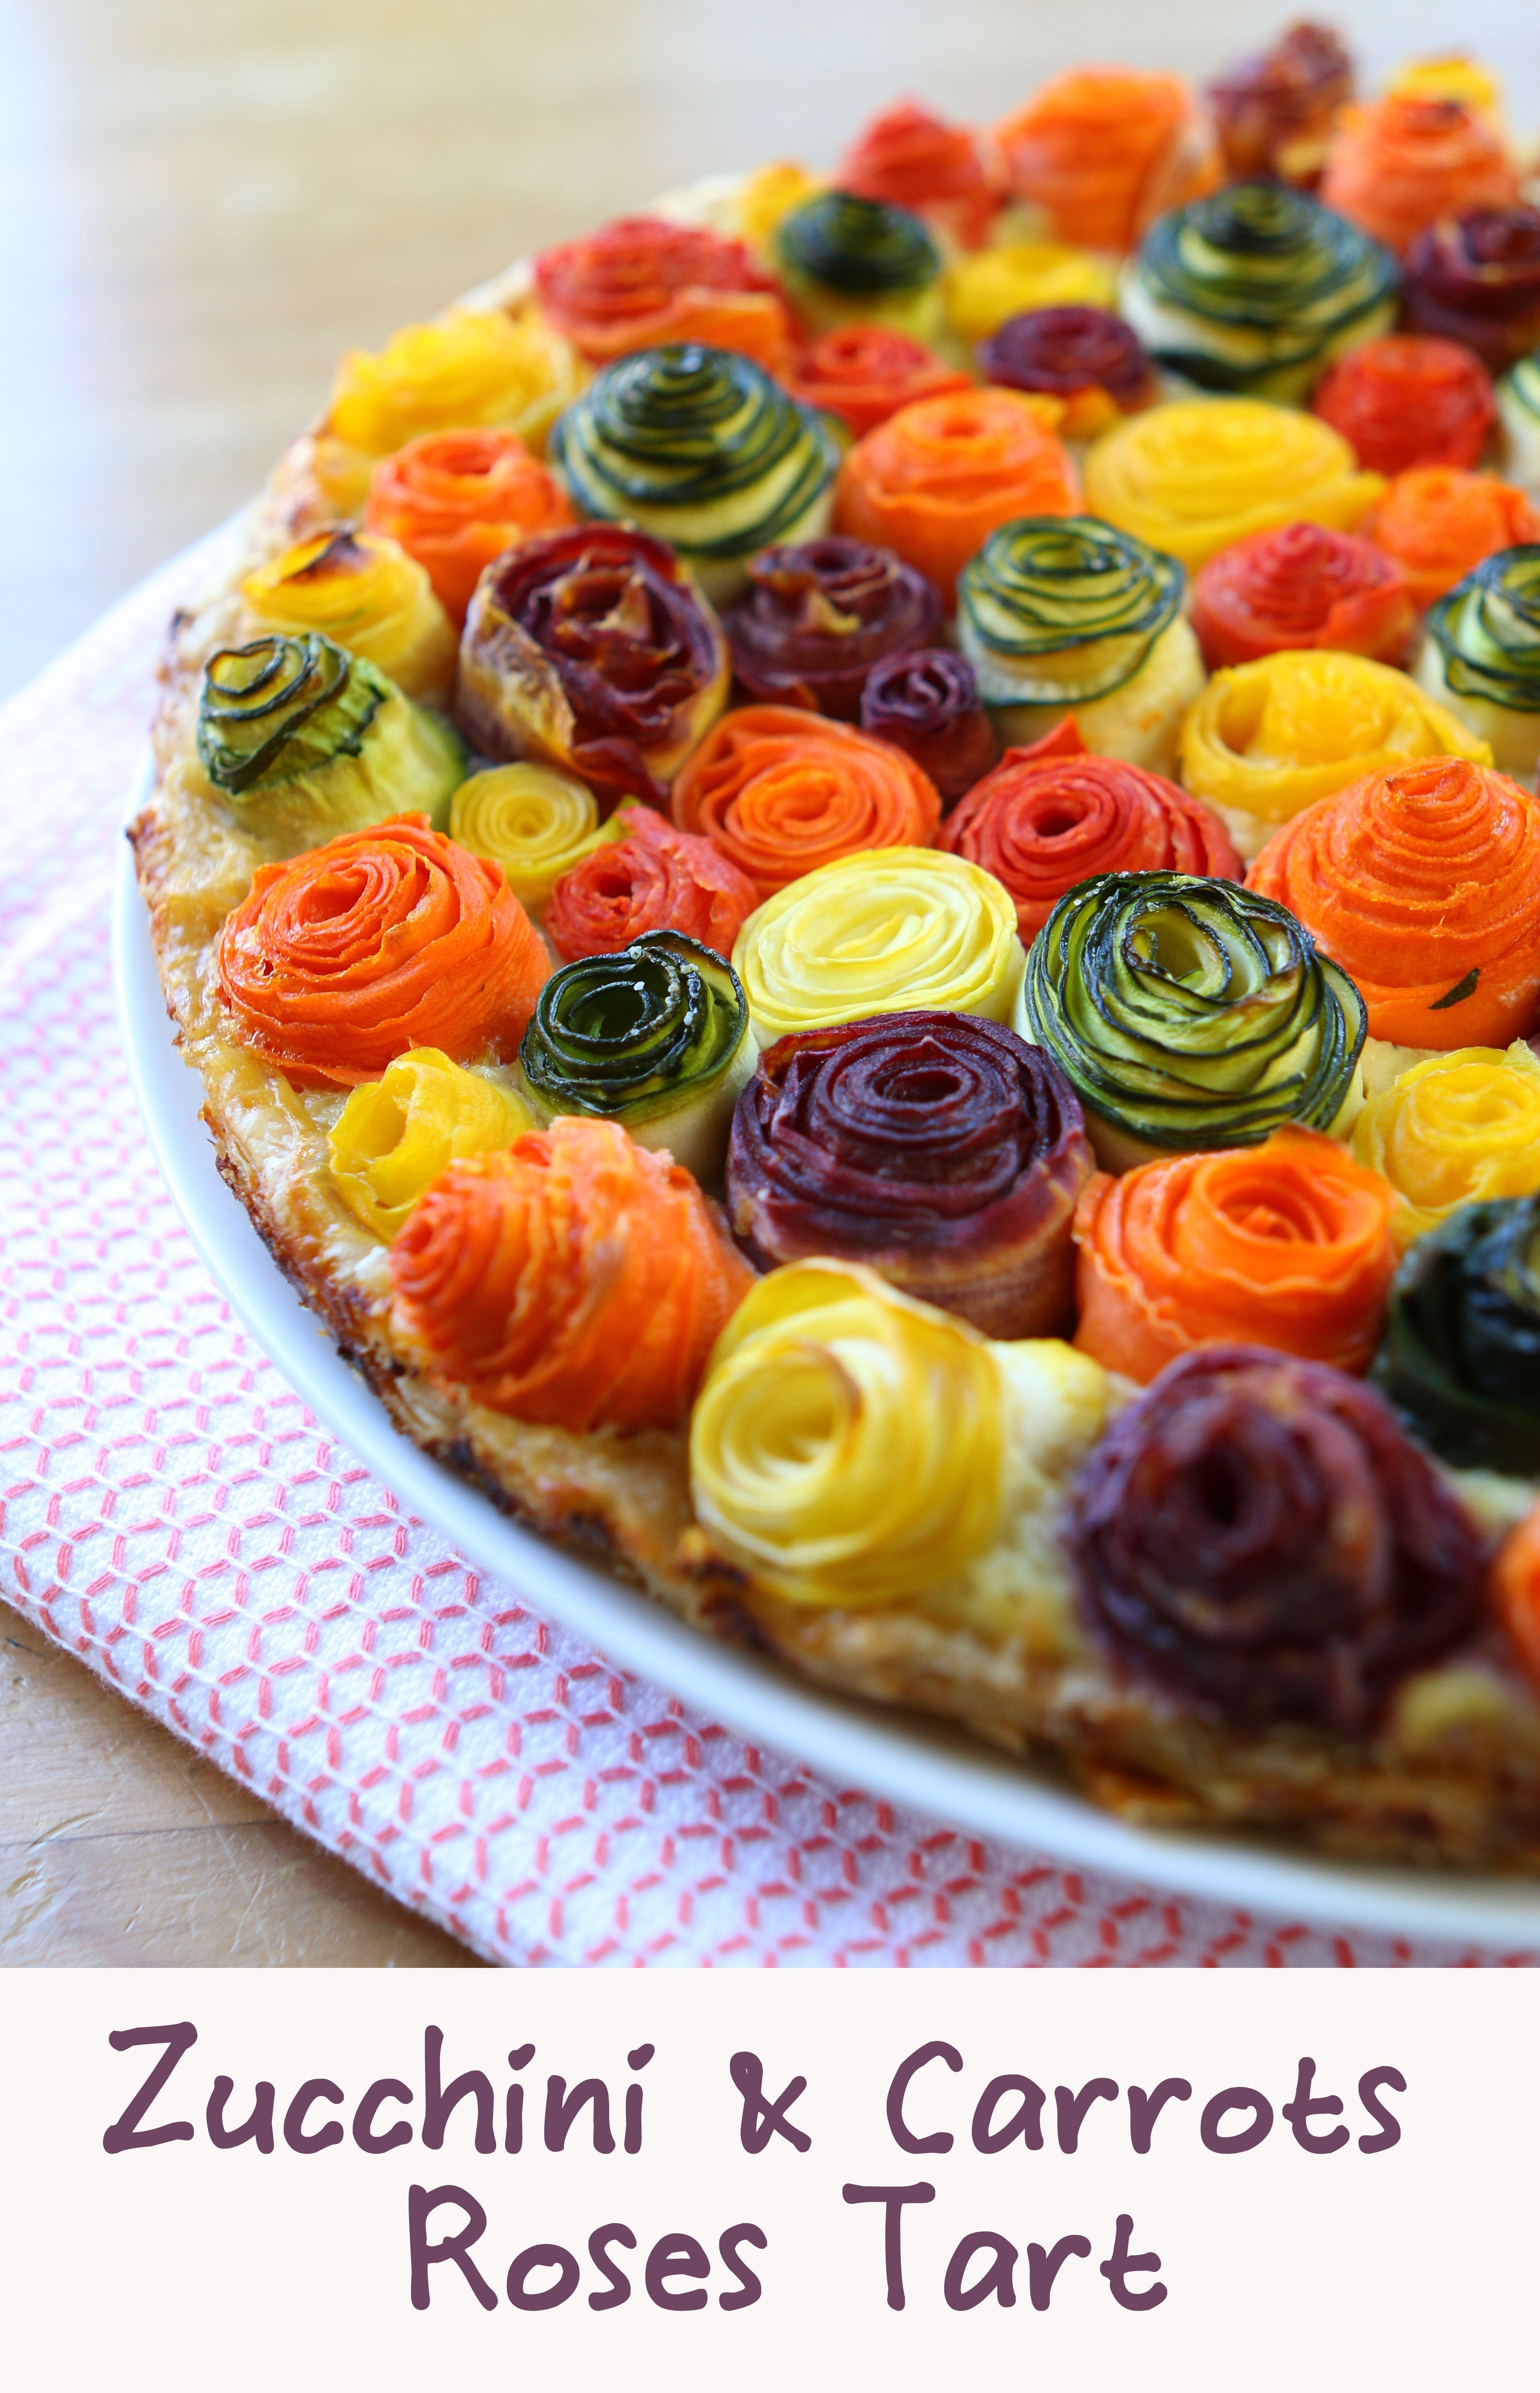 Zucchini Carrots Rose Tart   Buona Pappa